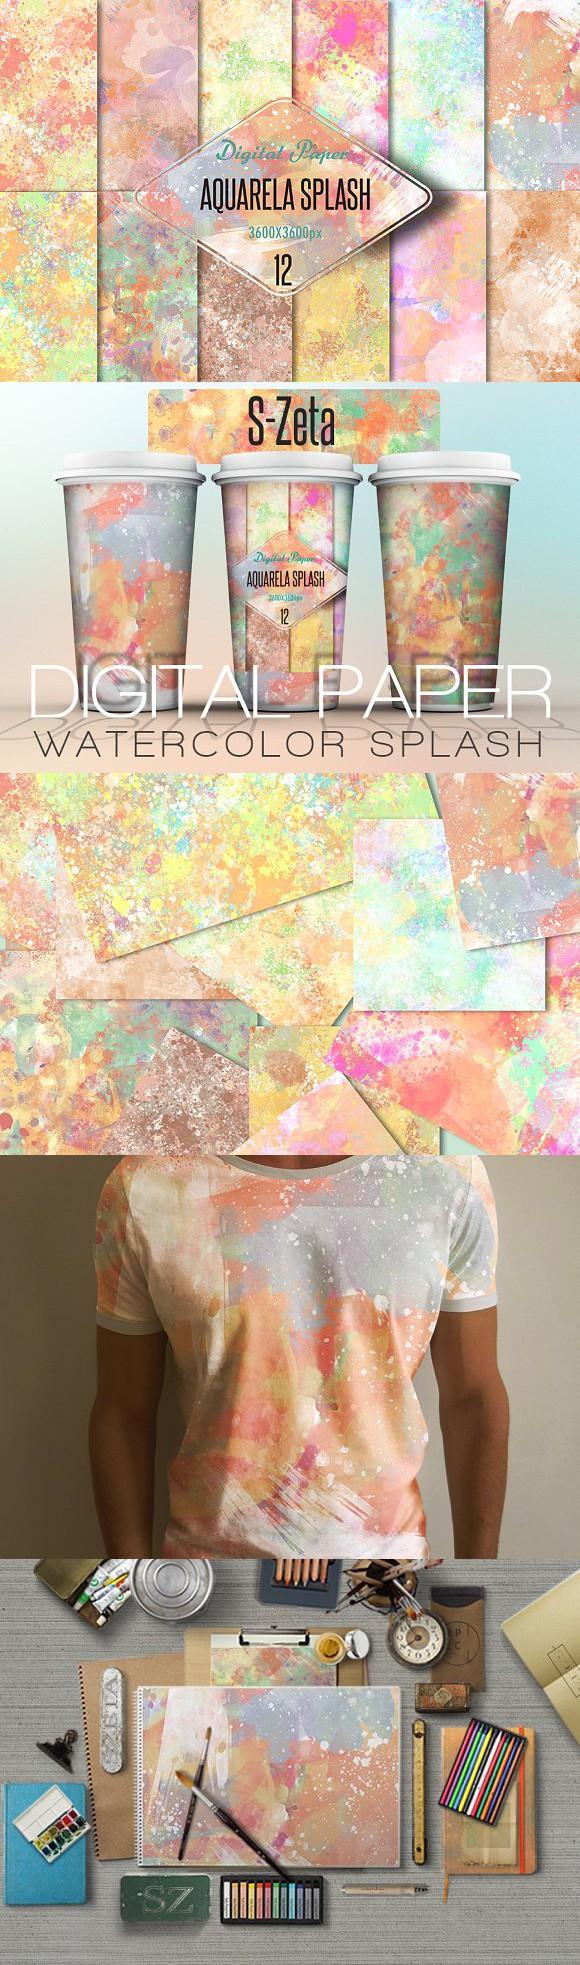 Watercolor splash-digital paper. Patterns